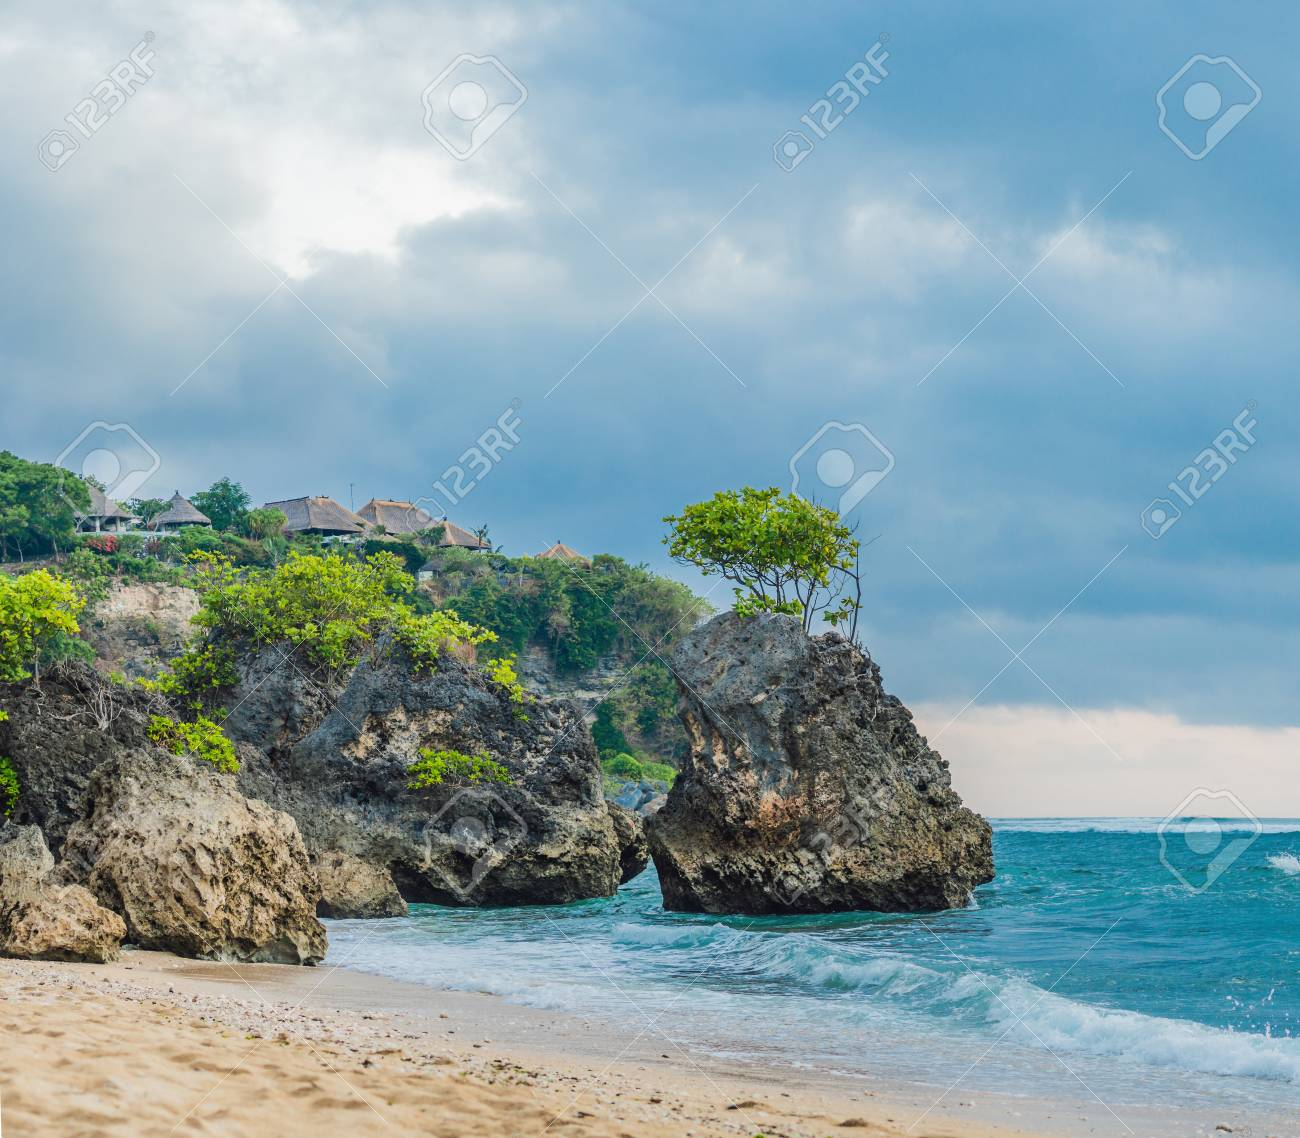 Rocks On Dreamland Beach Bali Island Indonesia Stock Photo Picture